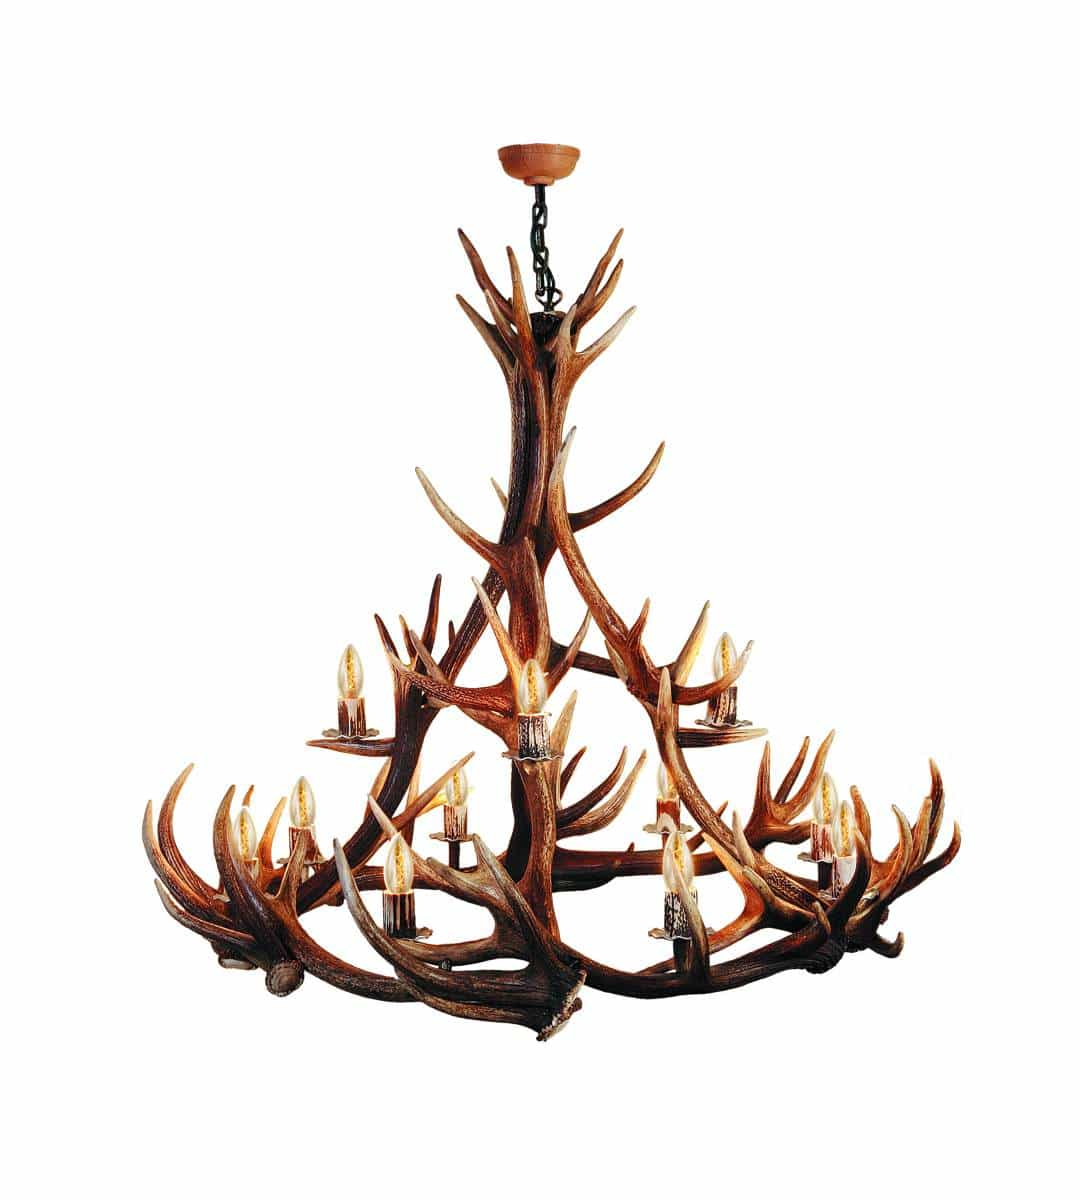 hallwyl 12 flammiger kronleuchter aus hirschgeweih. Black Bedroom Furniture Sets. Home Design Ideas